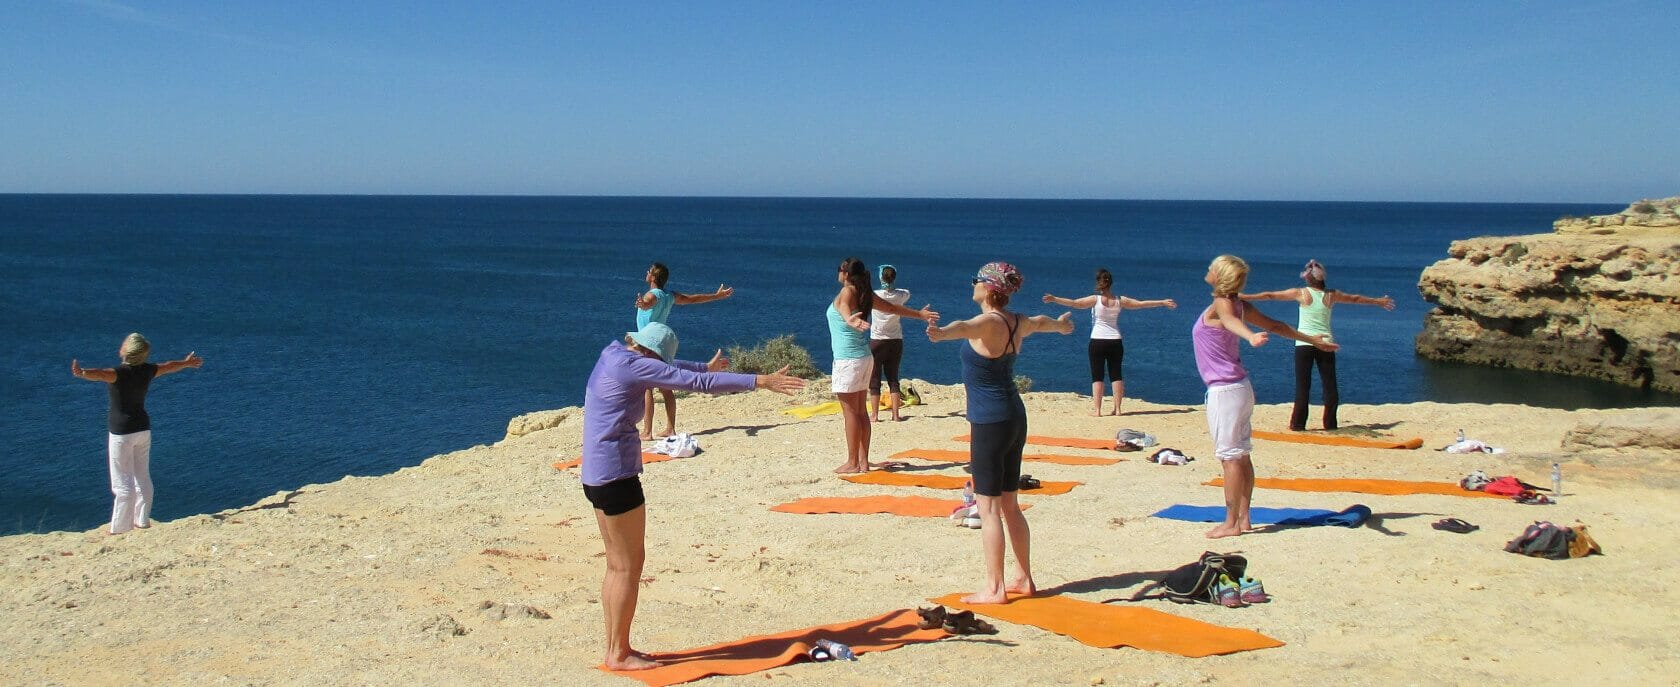 Qi Gong Urlaub am Meer: Gruppe übt auf Klippe am Meer